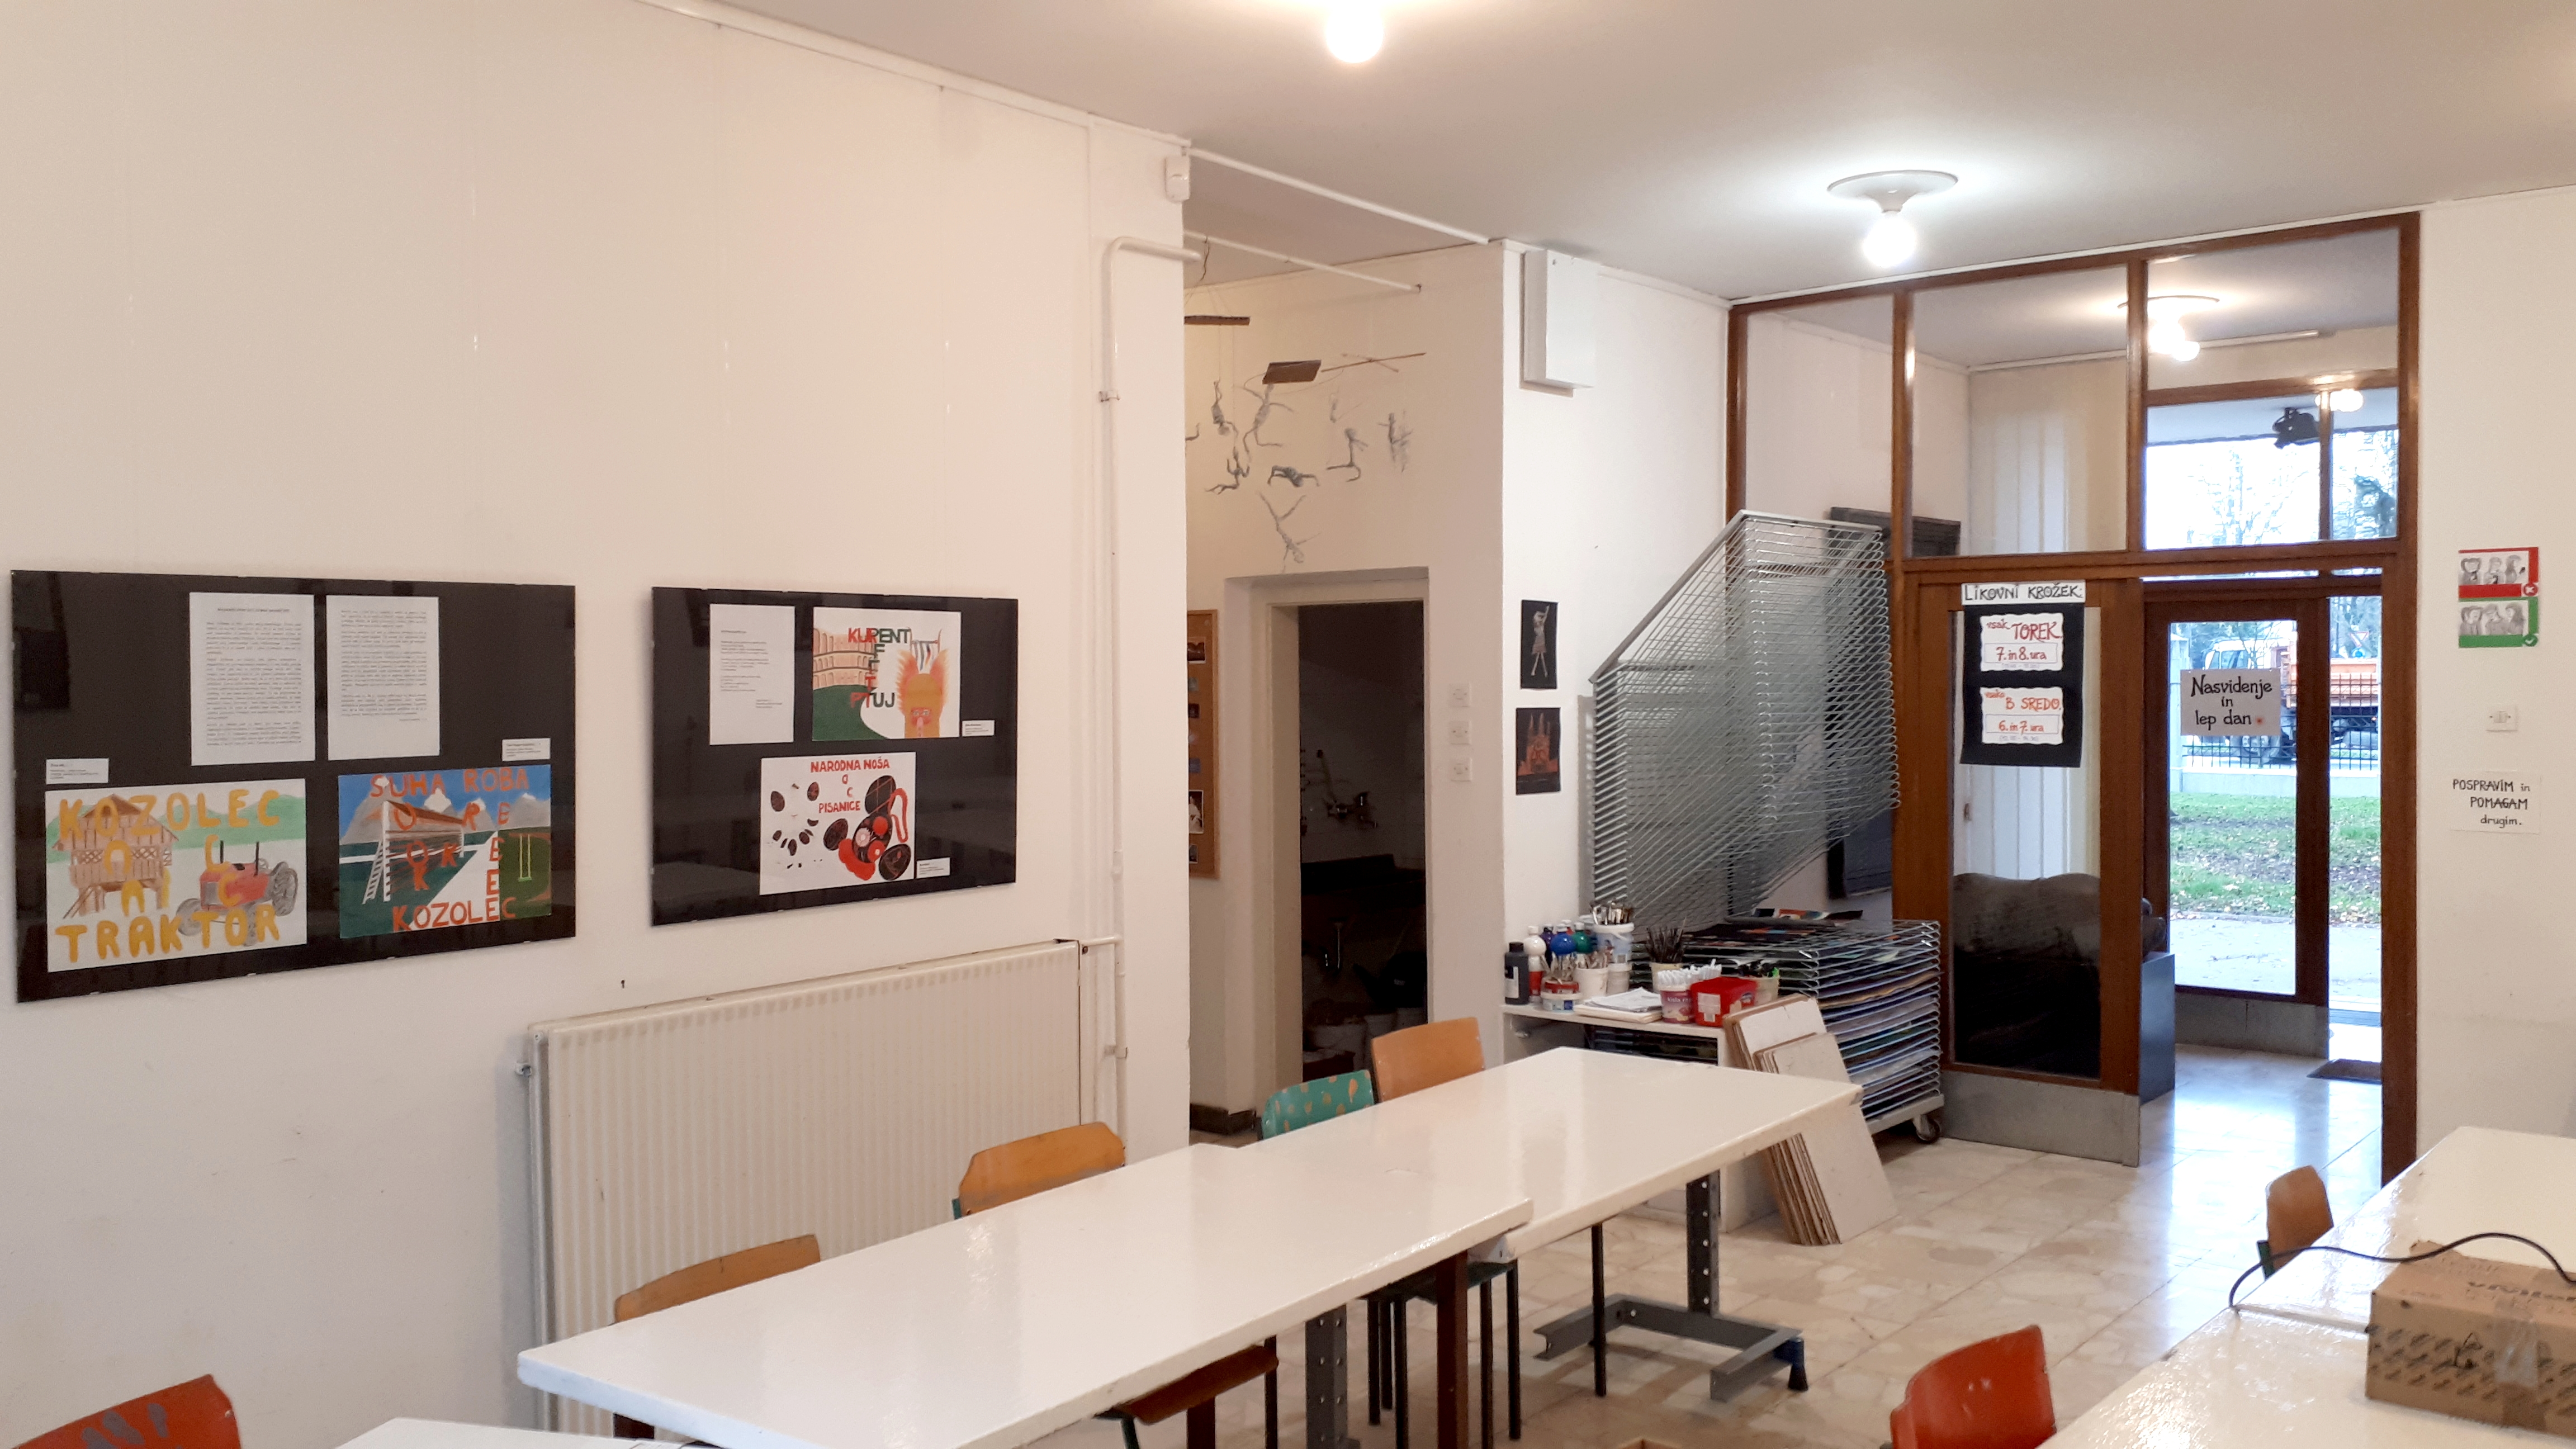 uc48dilnica-v-galeriji1